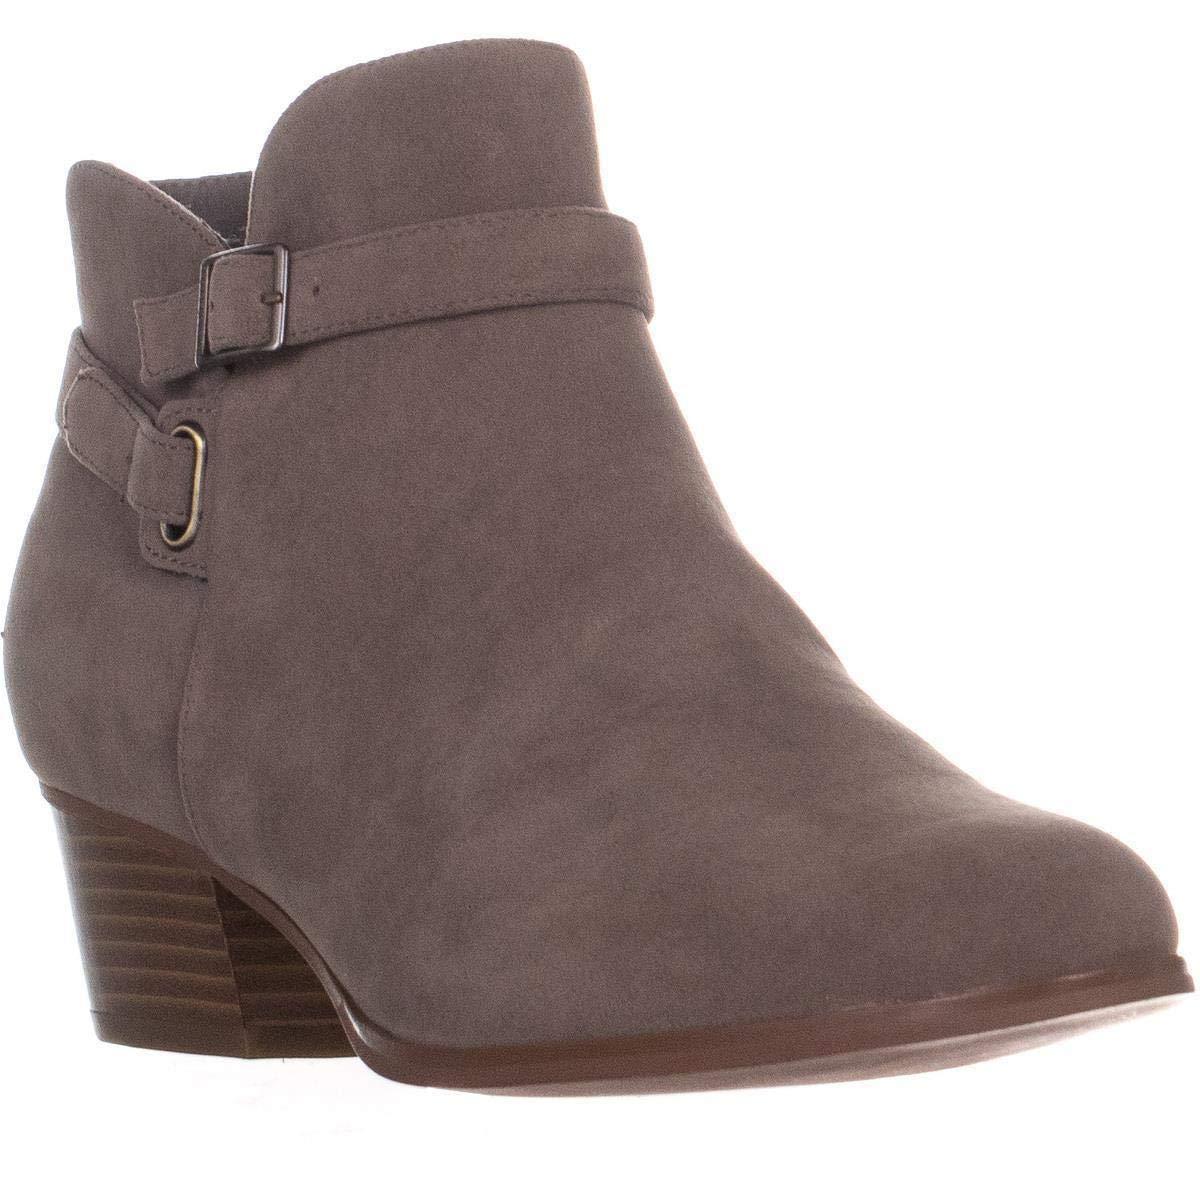 thumbnail 15 - Giani-Bernini-Womens-Dorii-Leather-Almond-Toe-Ankle-Fashion-Boots